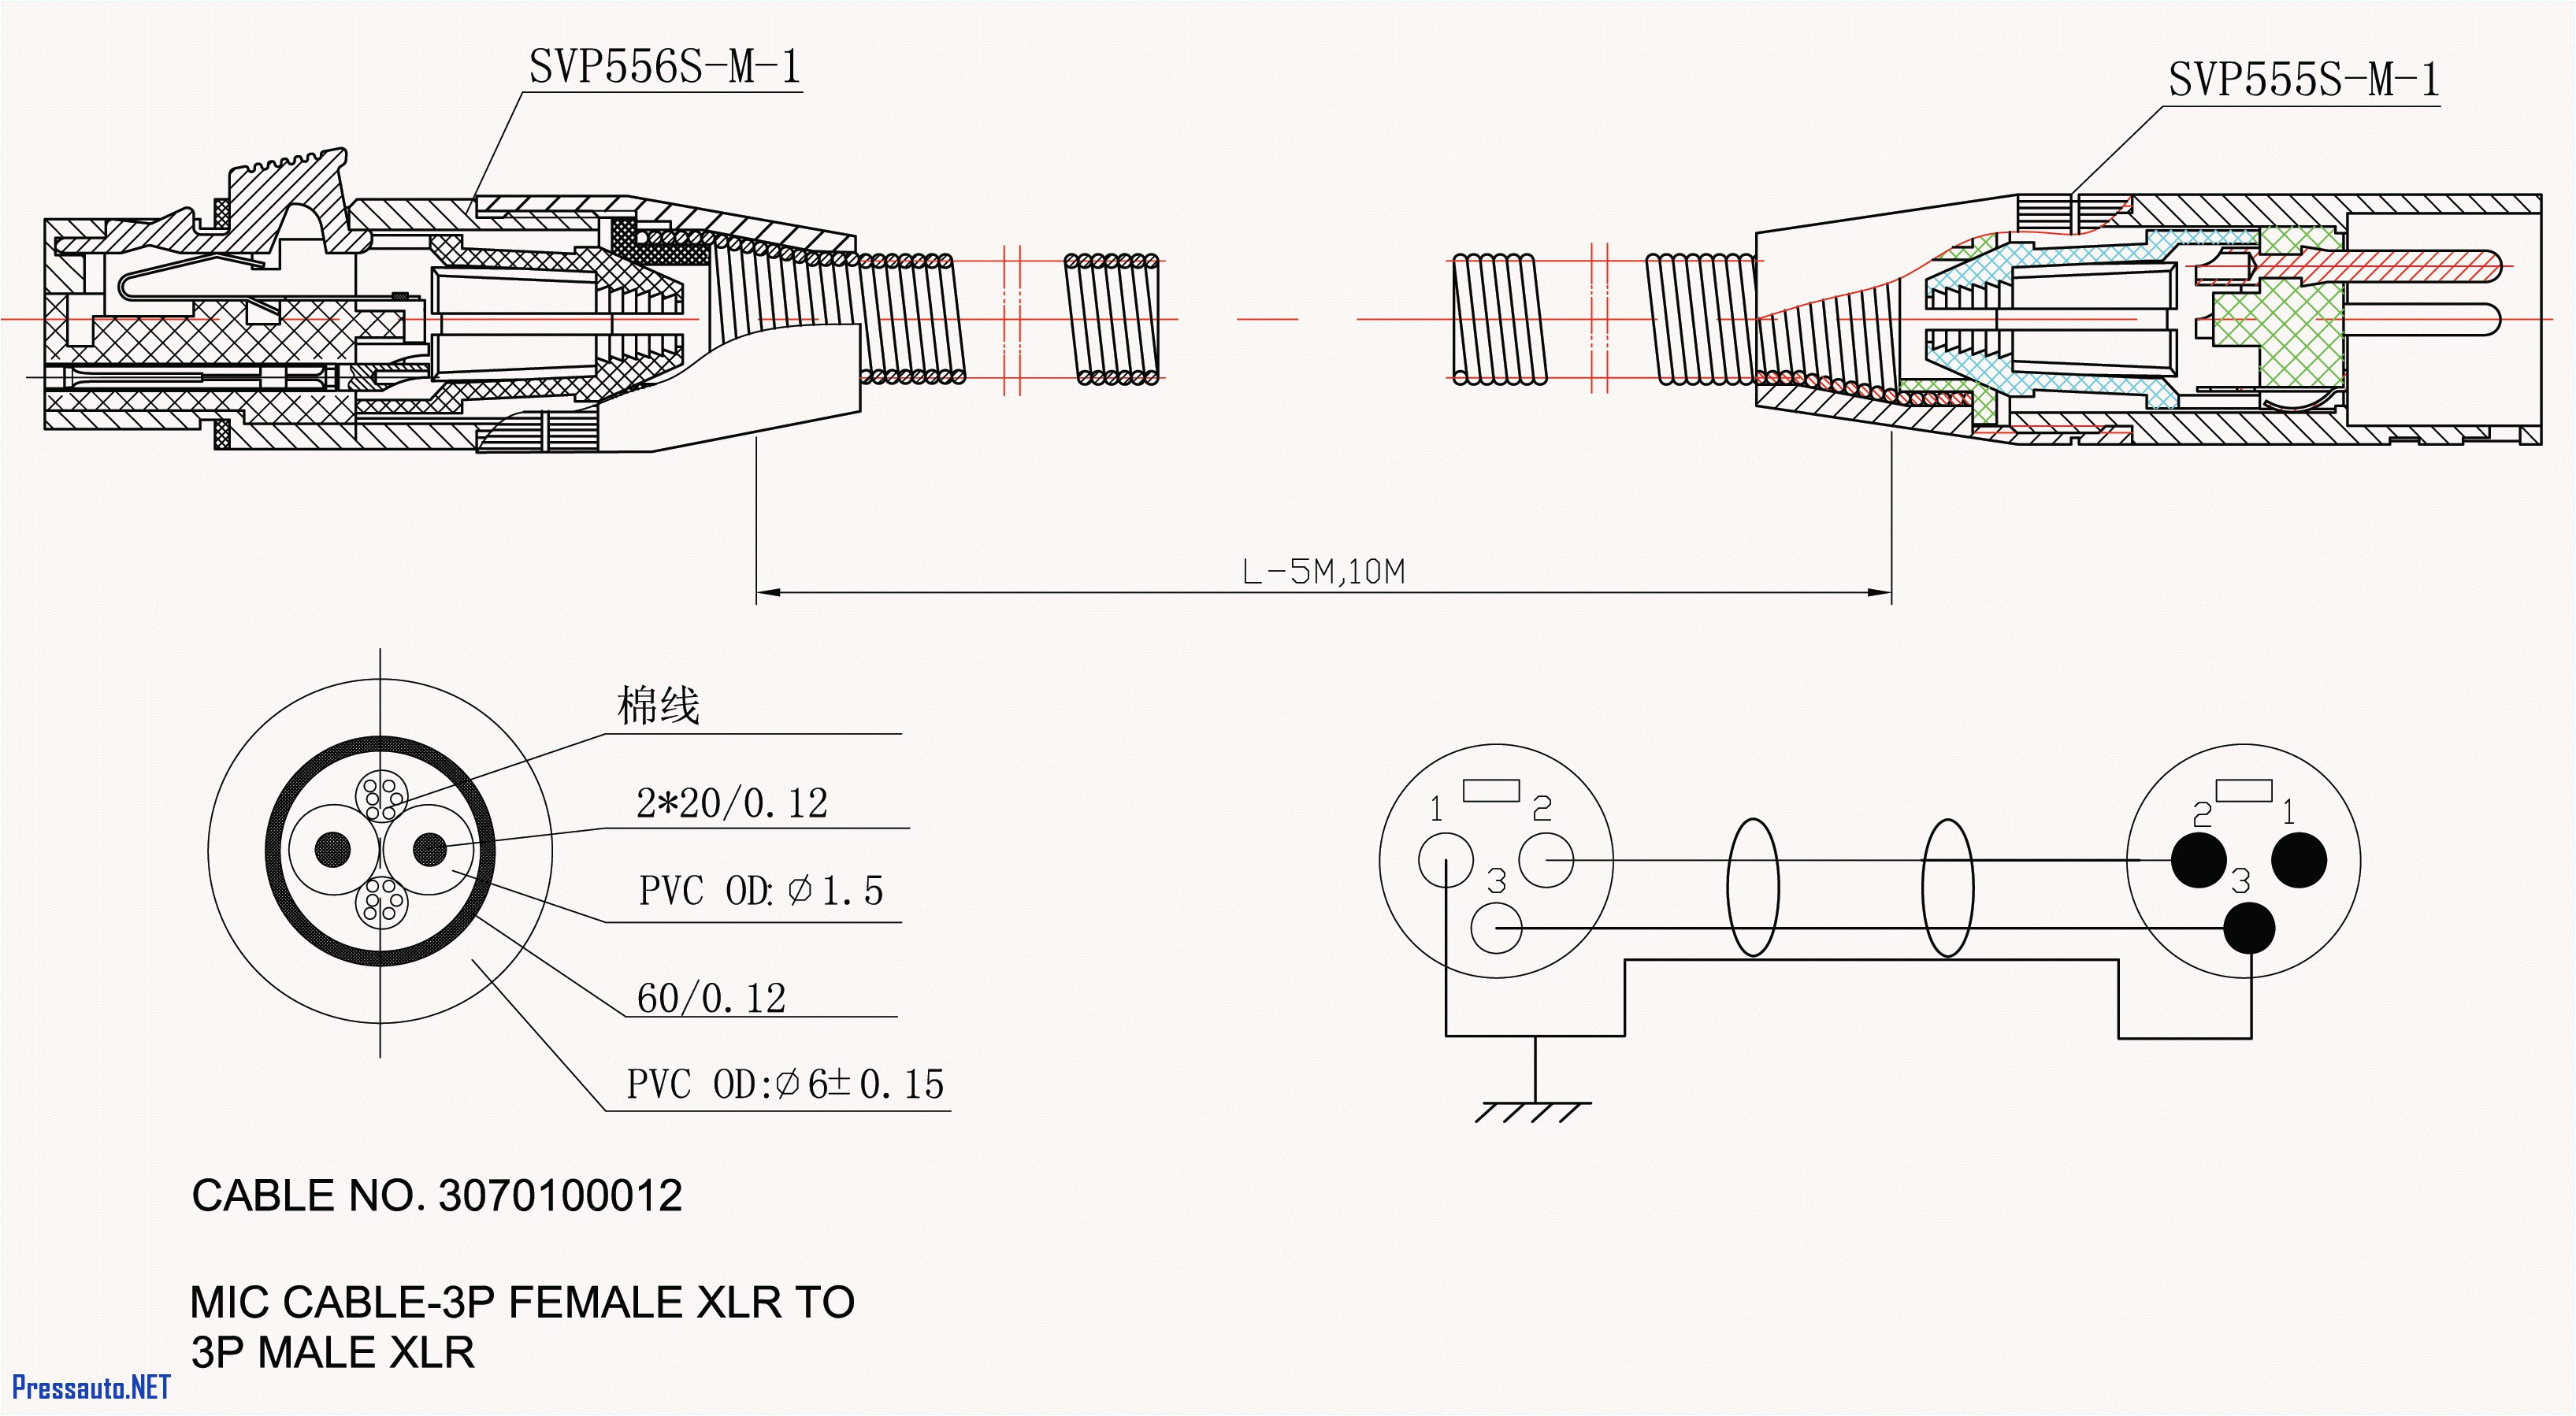 2003 chevy silverado radio wiring diagram new chevy radio wiring diagram best wiring diagram 2003 gmc sonoma 4k jpg